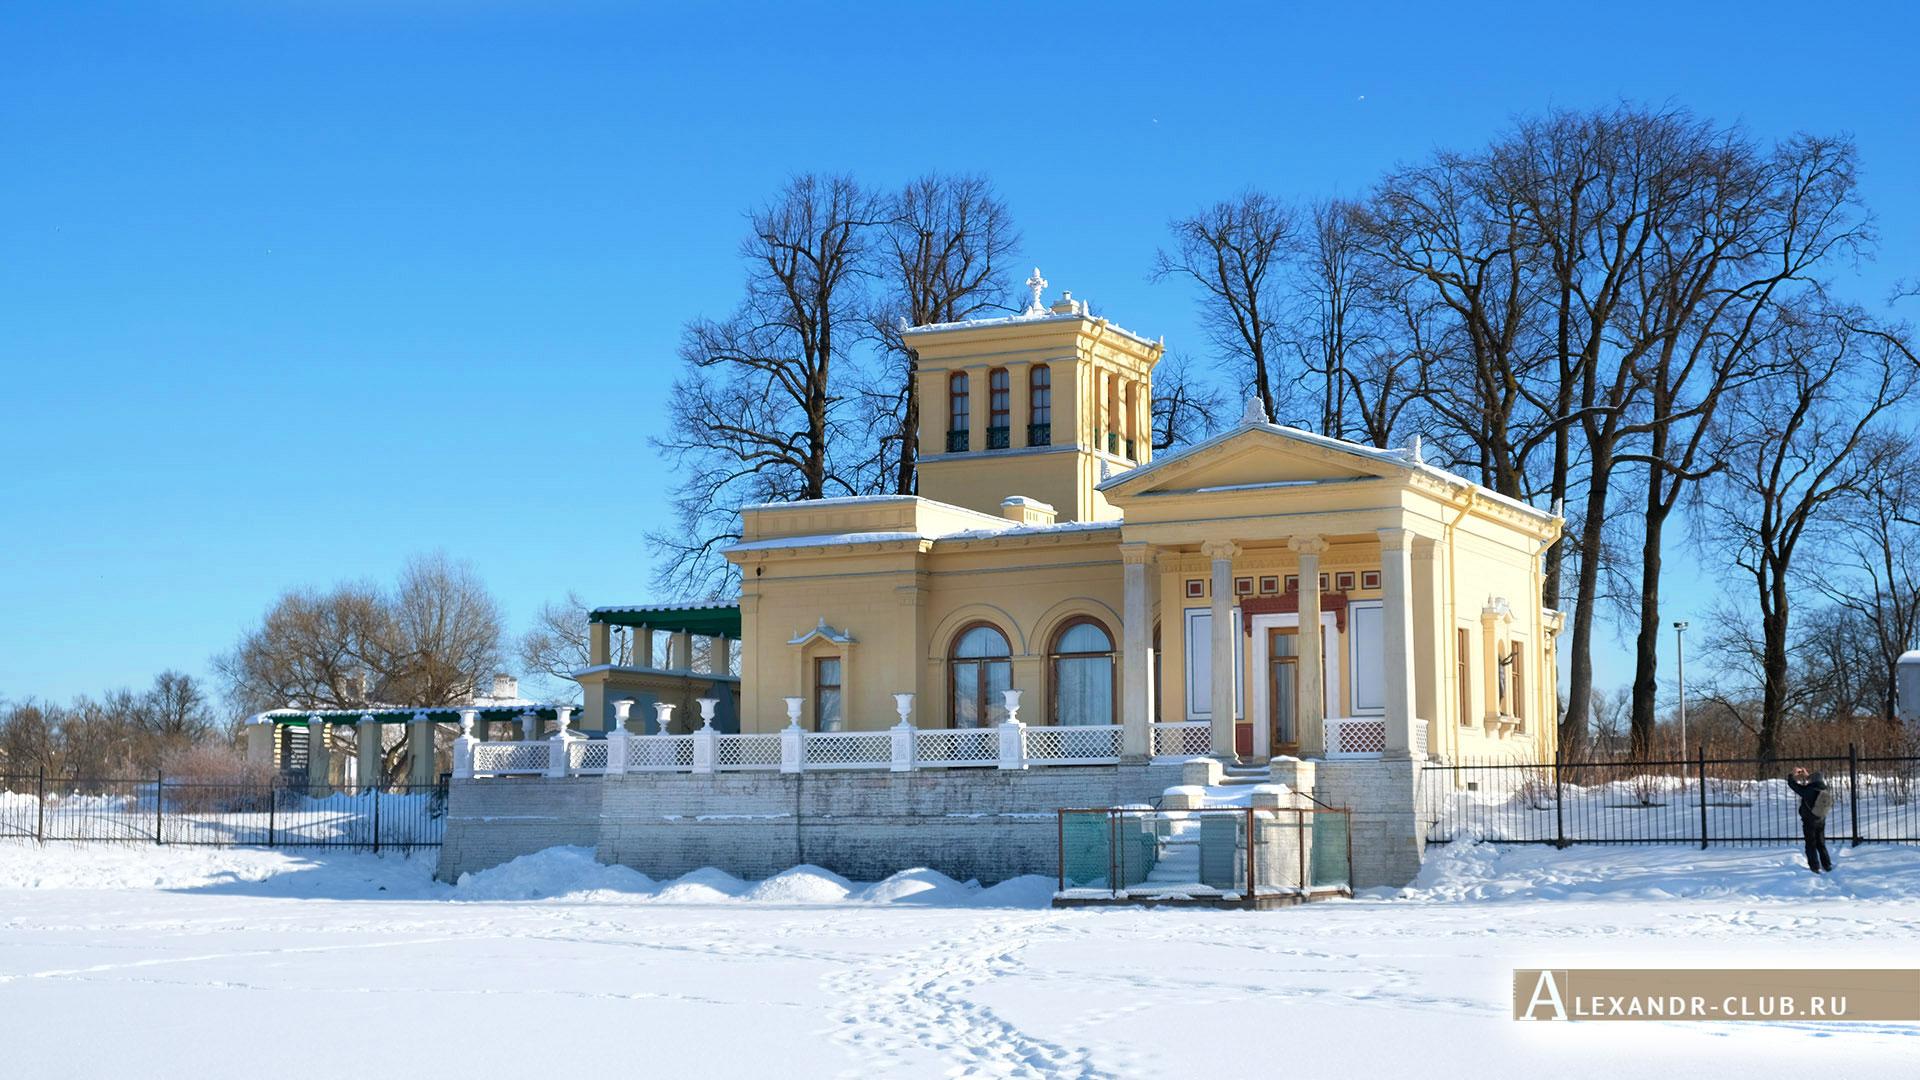 Петергоф, Колонистский парк, зима, Царицын павильон – 1